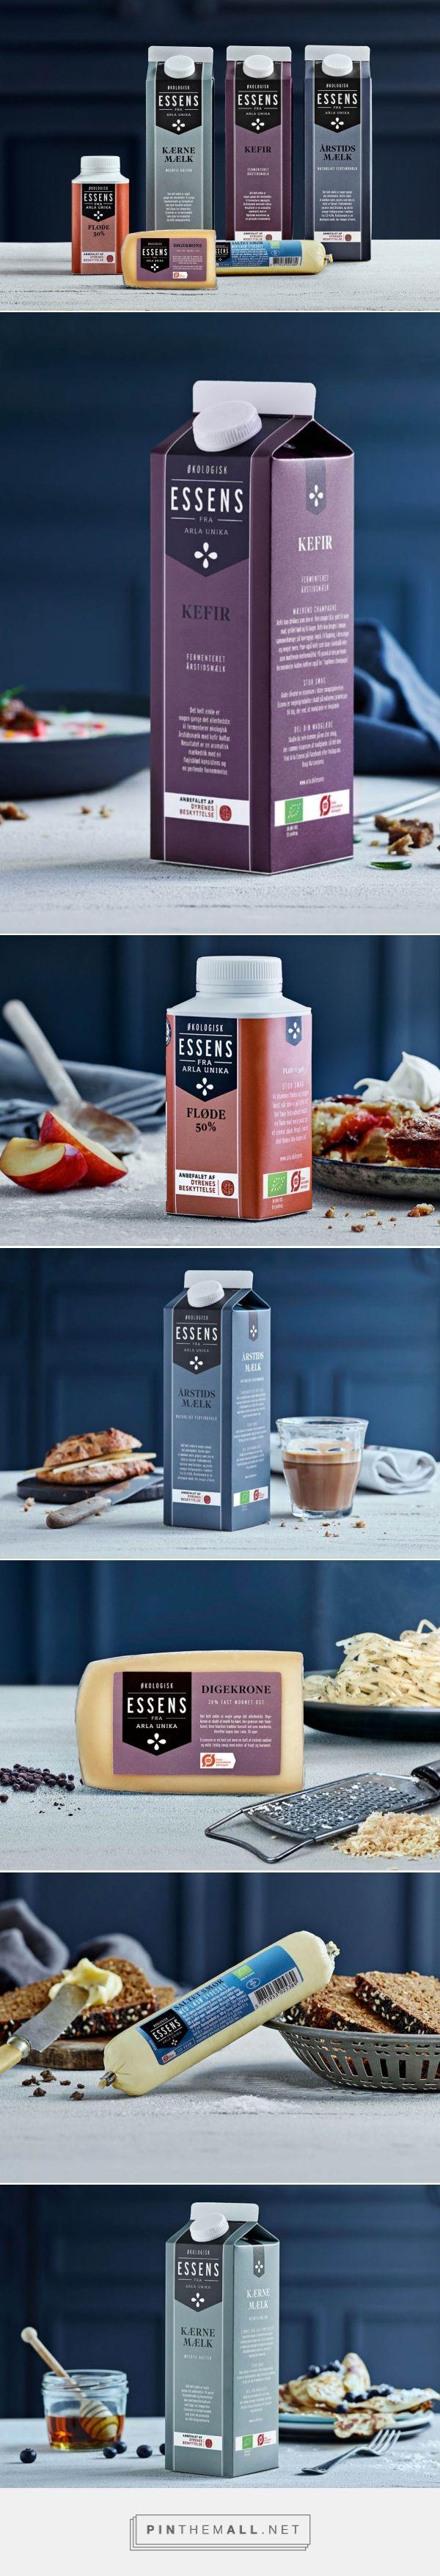 Essens Milk - Packaging of the World - Creative Package Design Gallery - http://www.packagingoftheworld.com/2016/09/essens.html